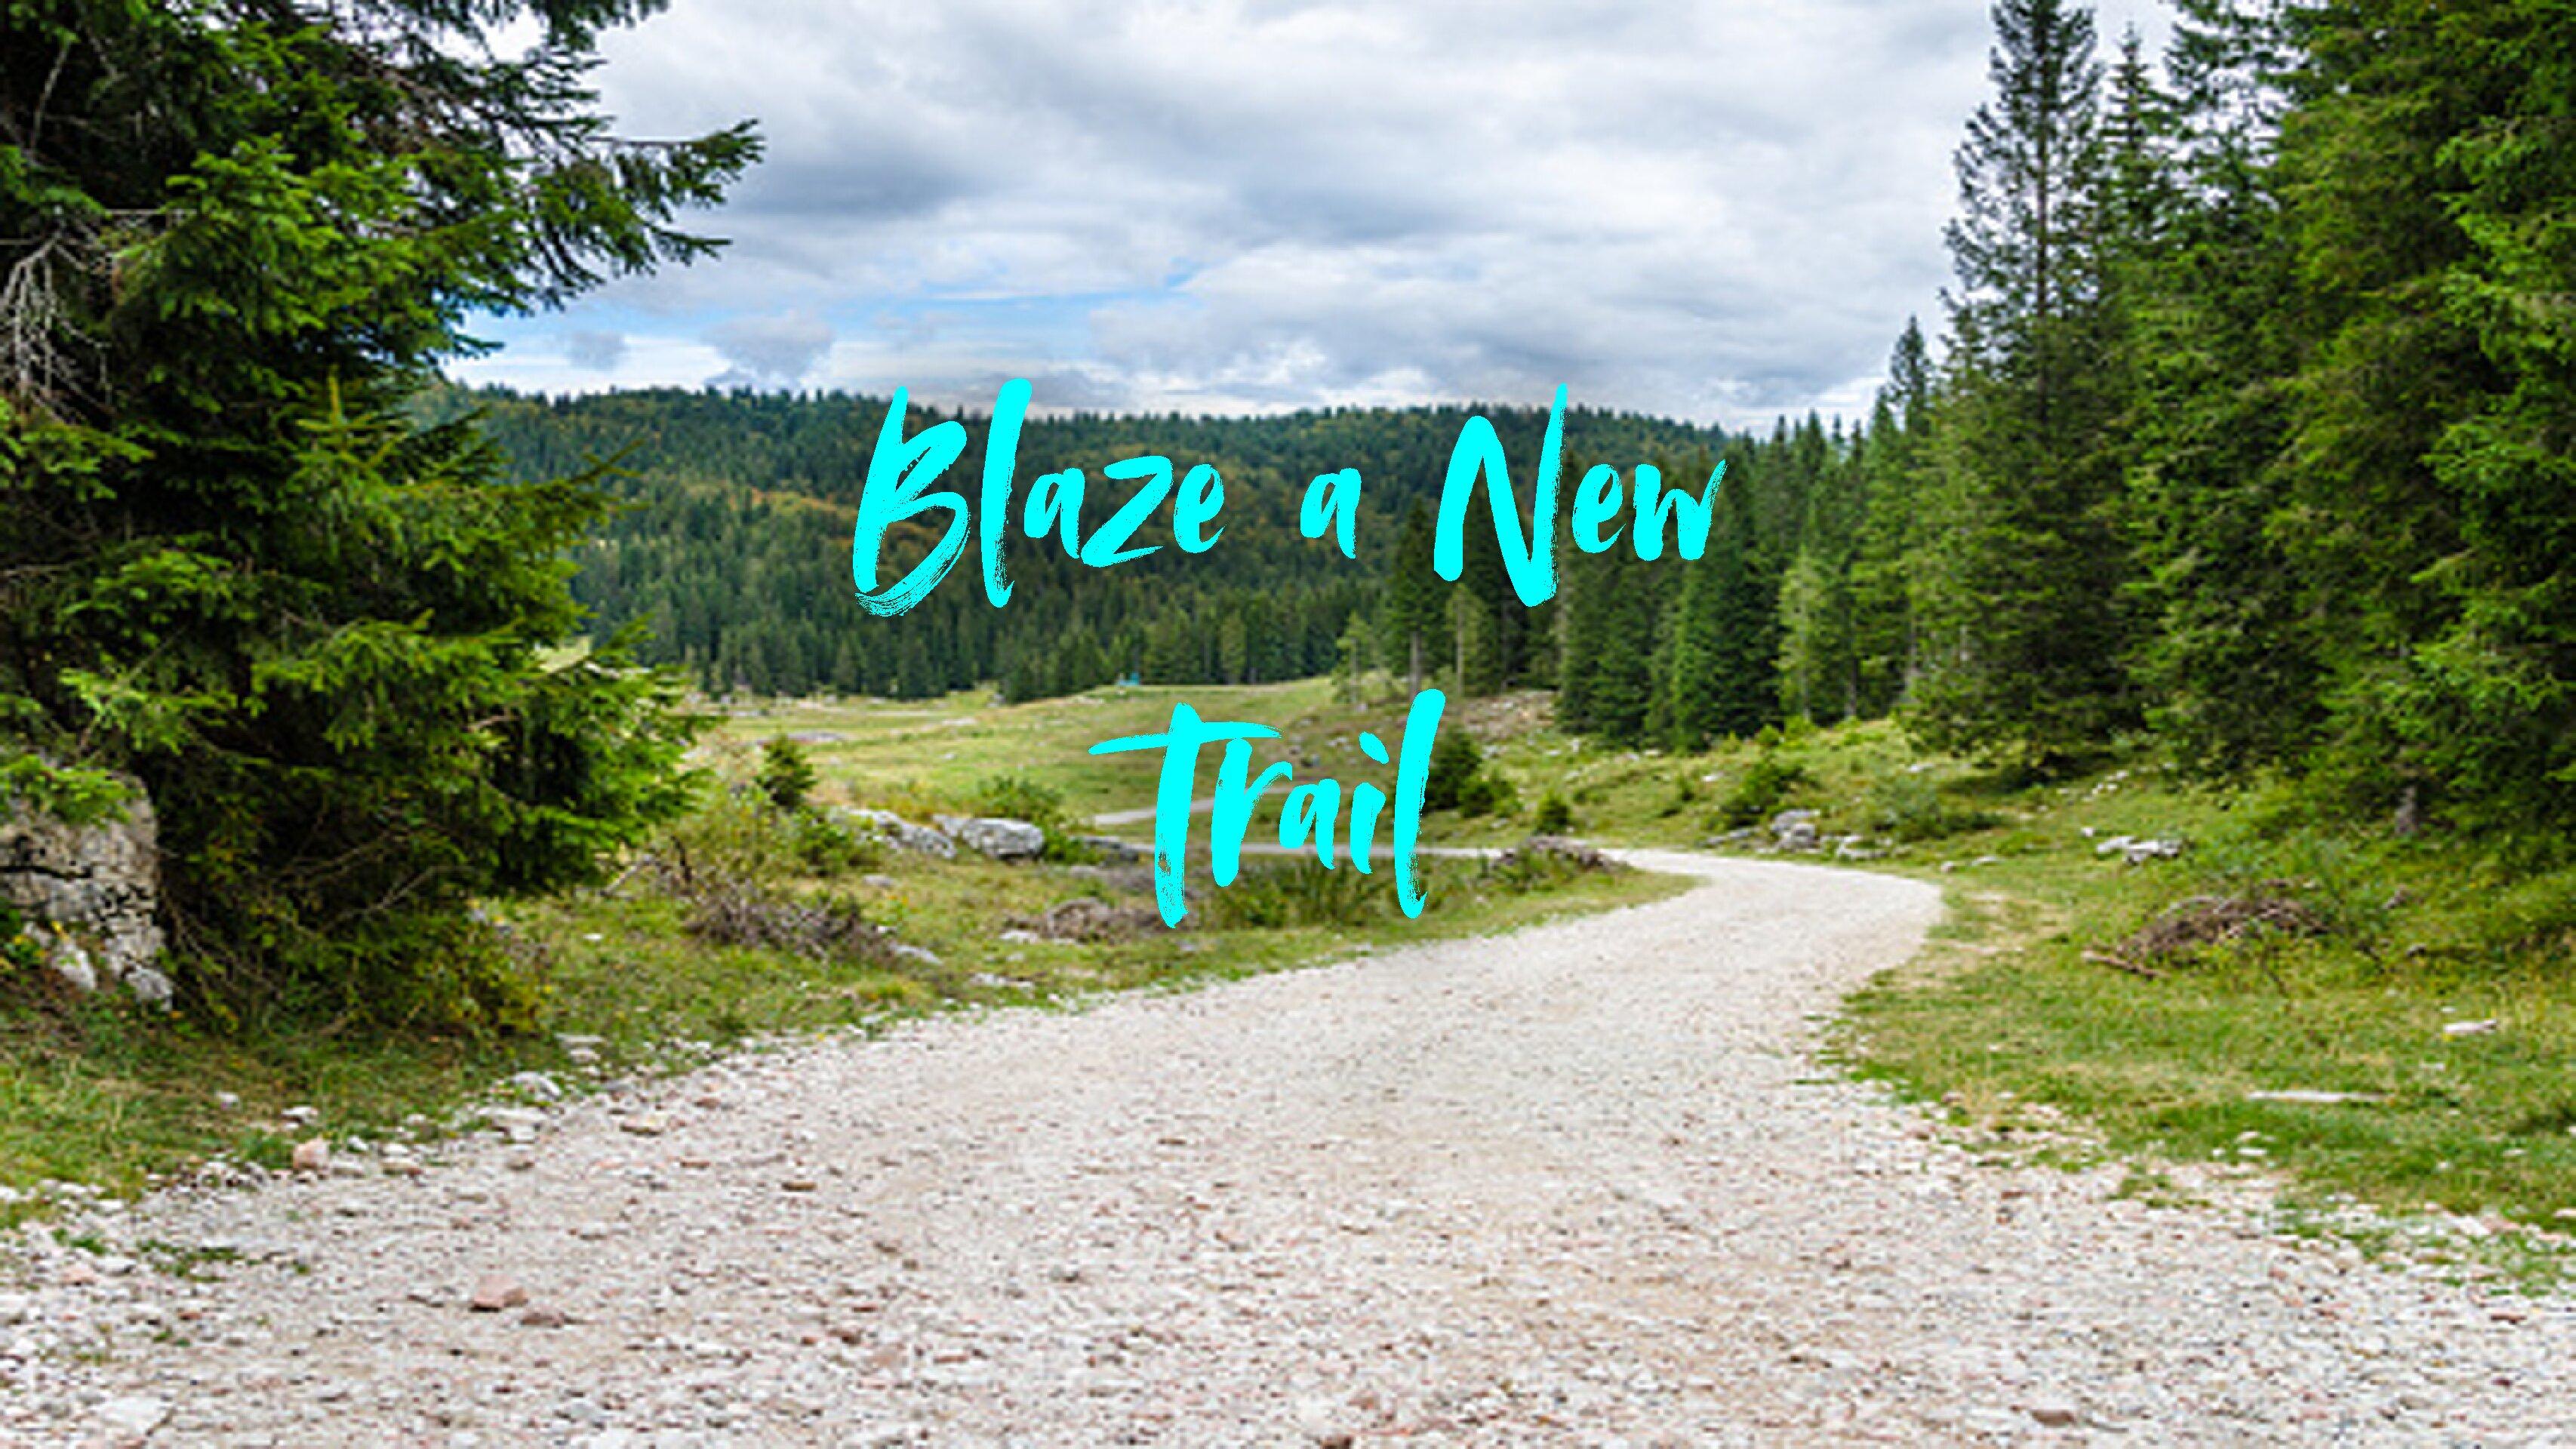 Blaze a New Trail